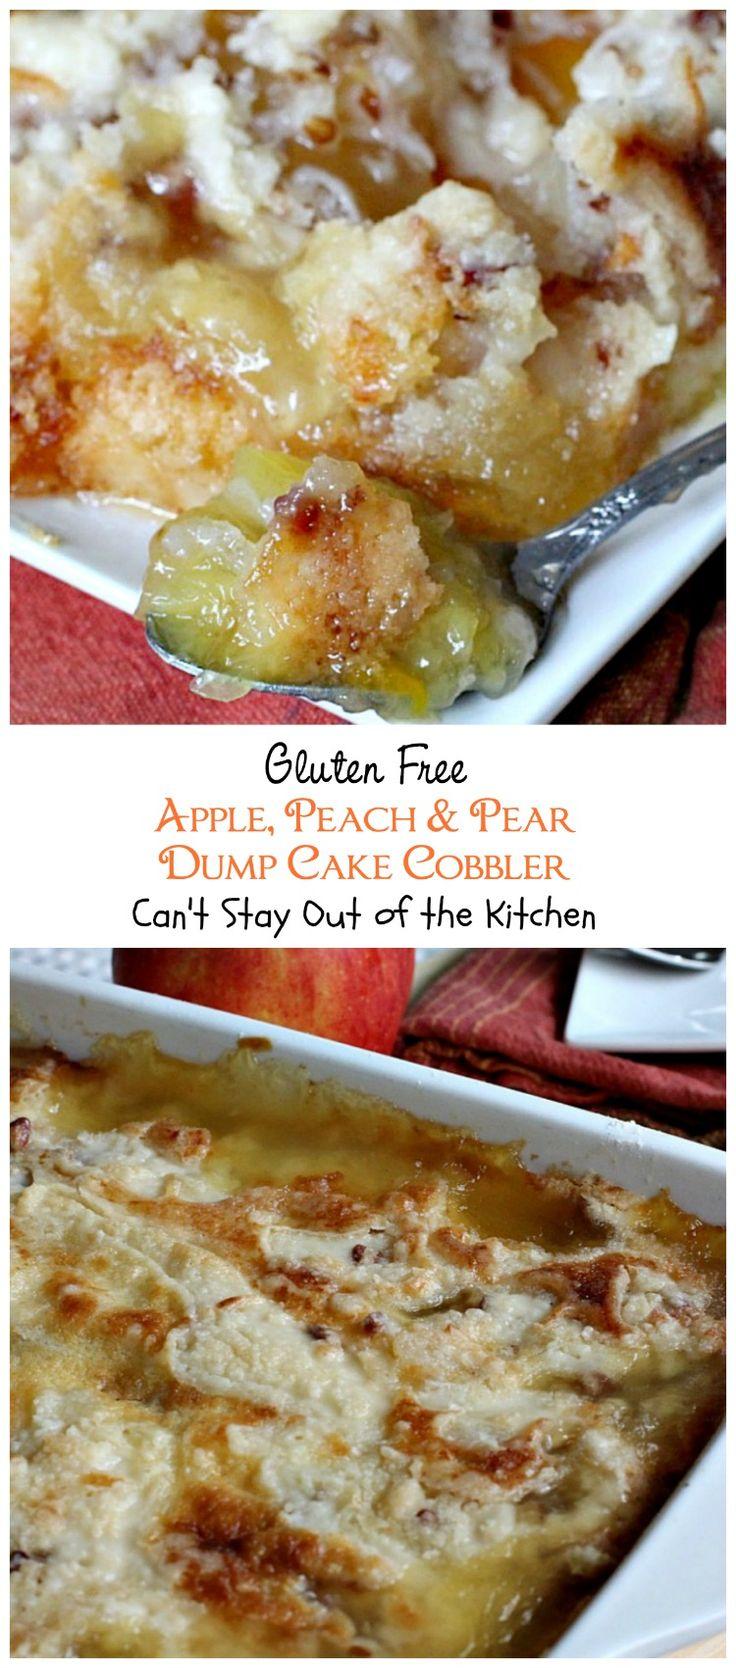 Gluten Free Apple, Peach and Pear Dump Cake Cobbler